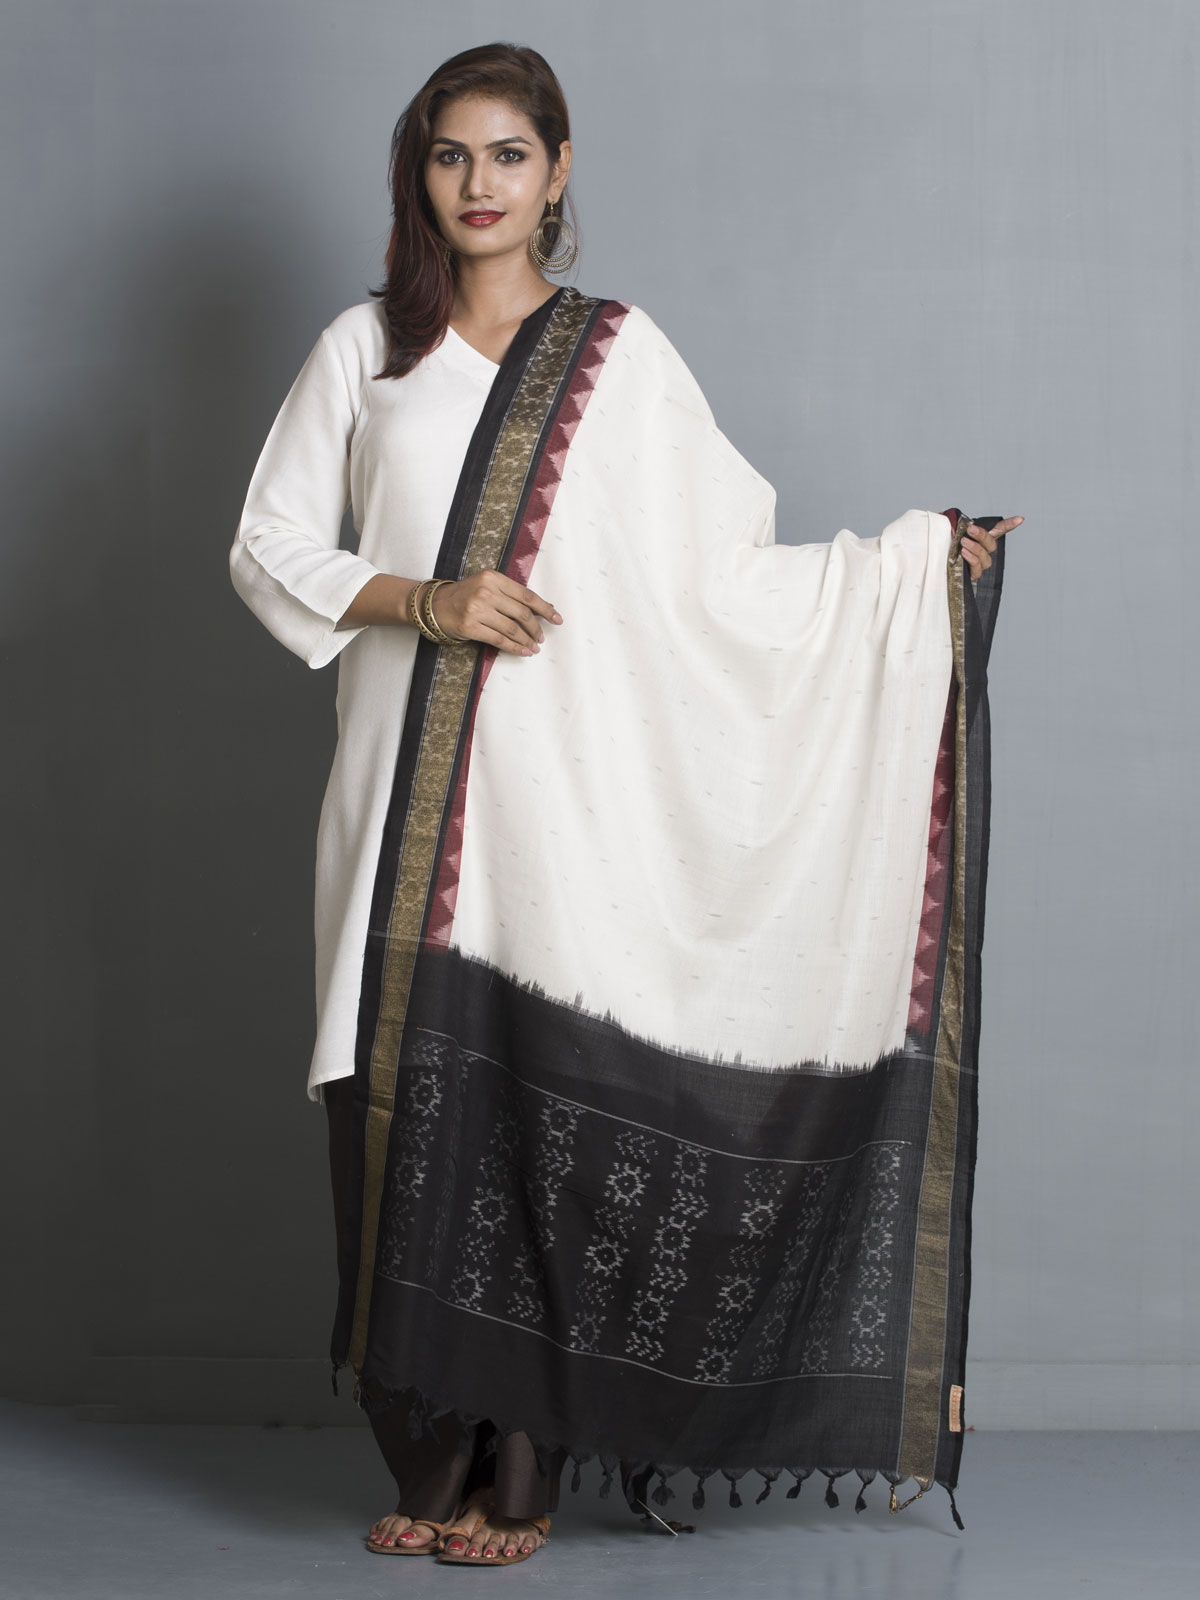 Black & white ikat cotton dupatta